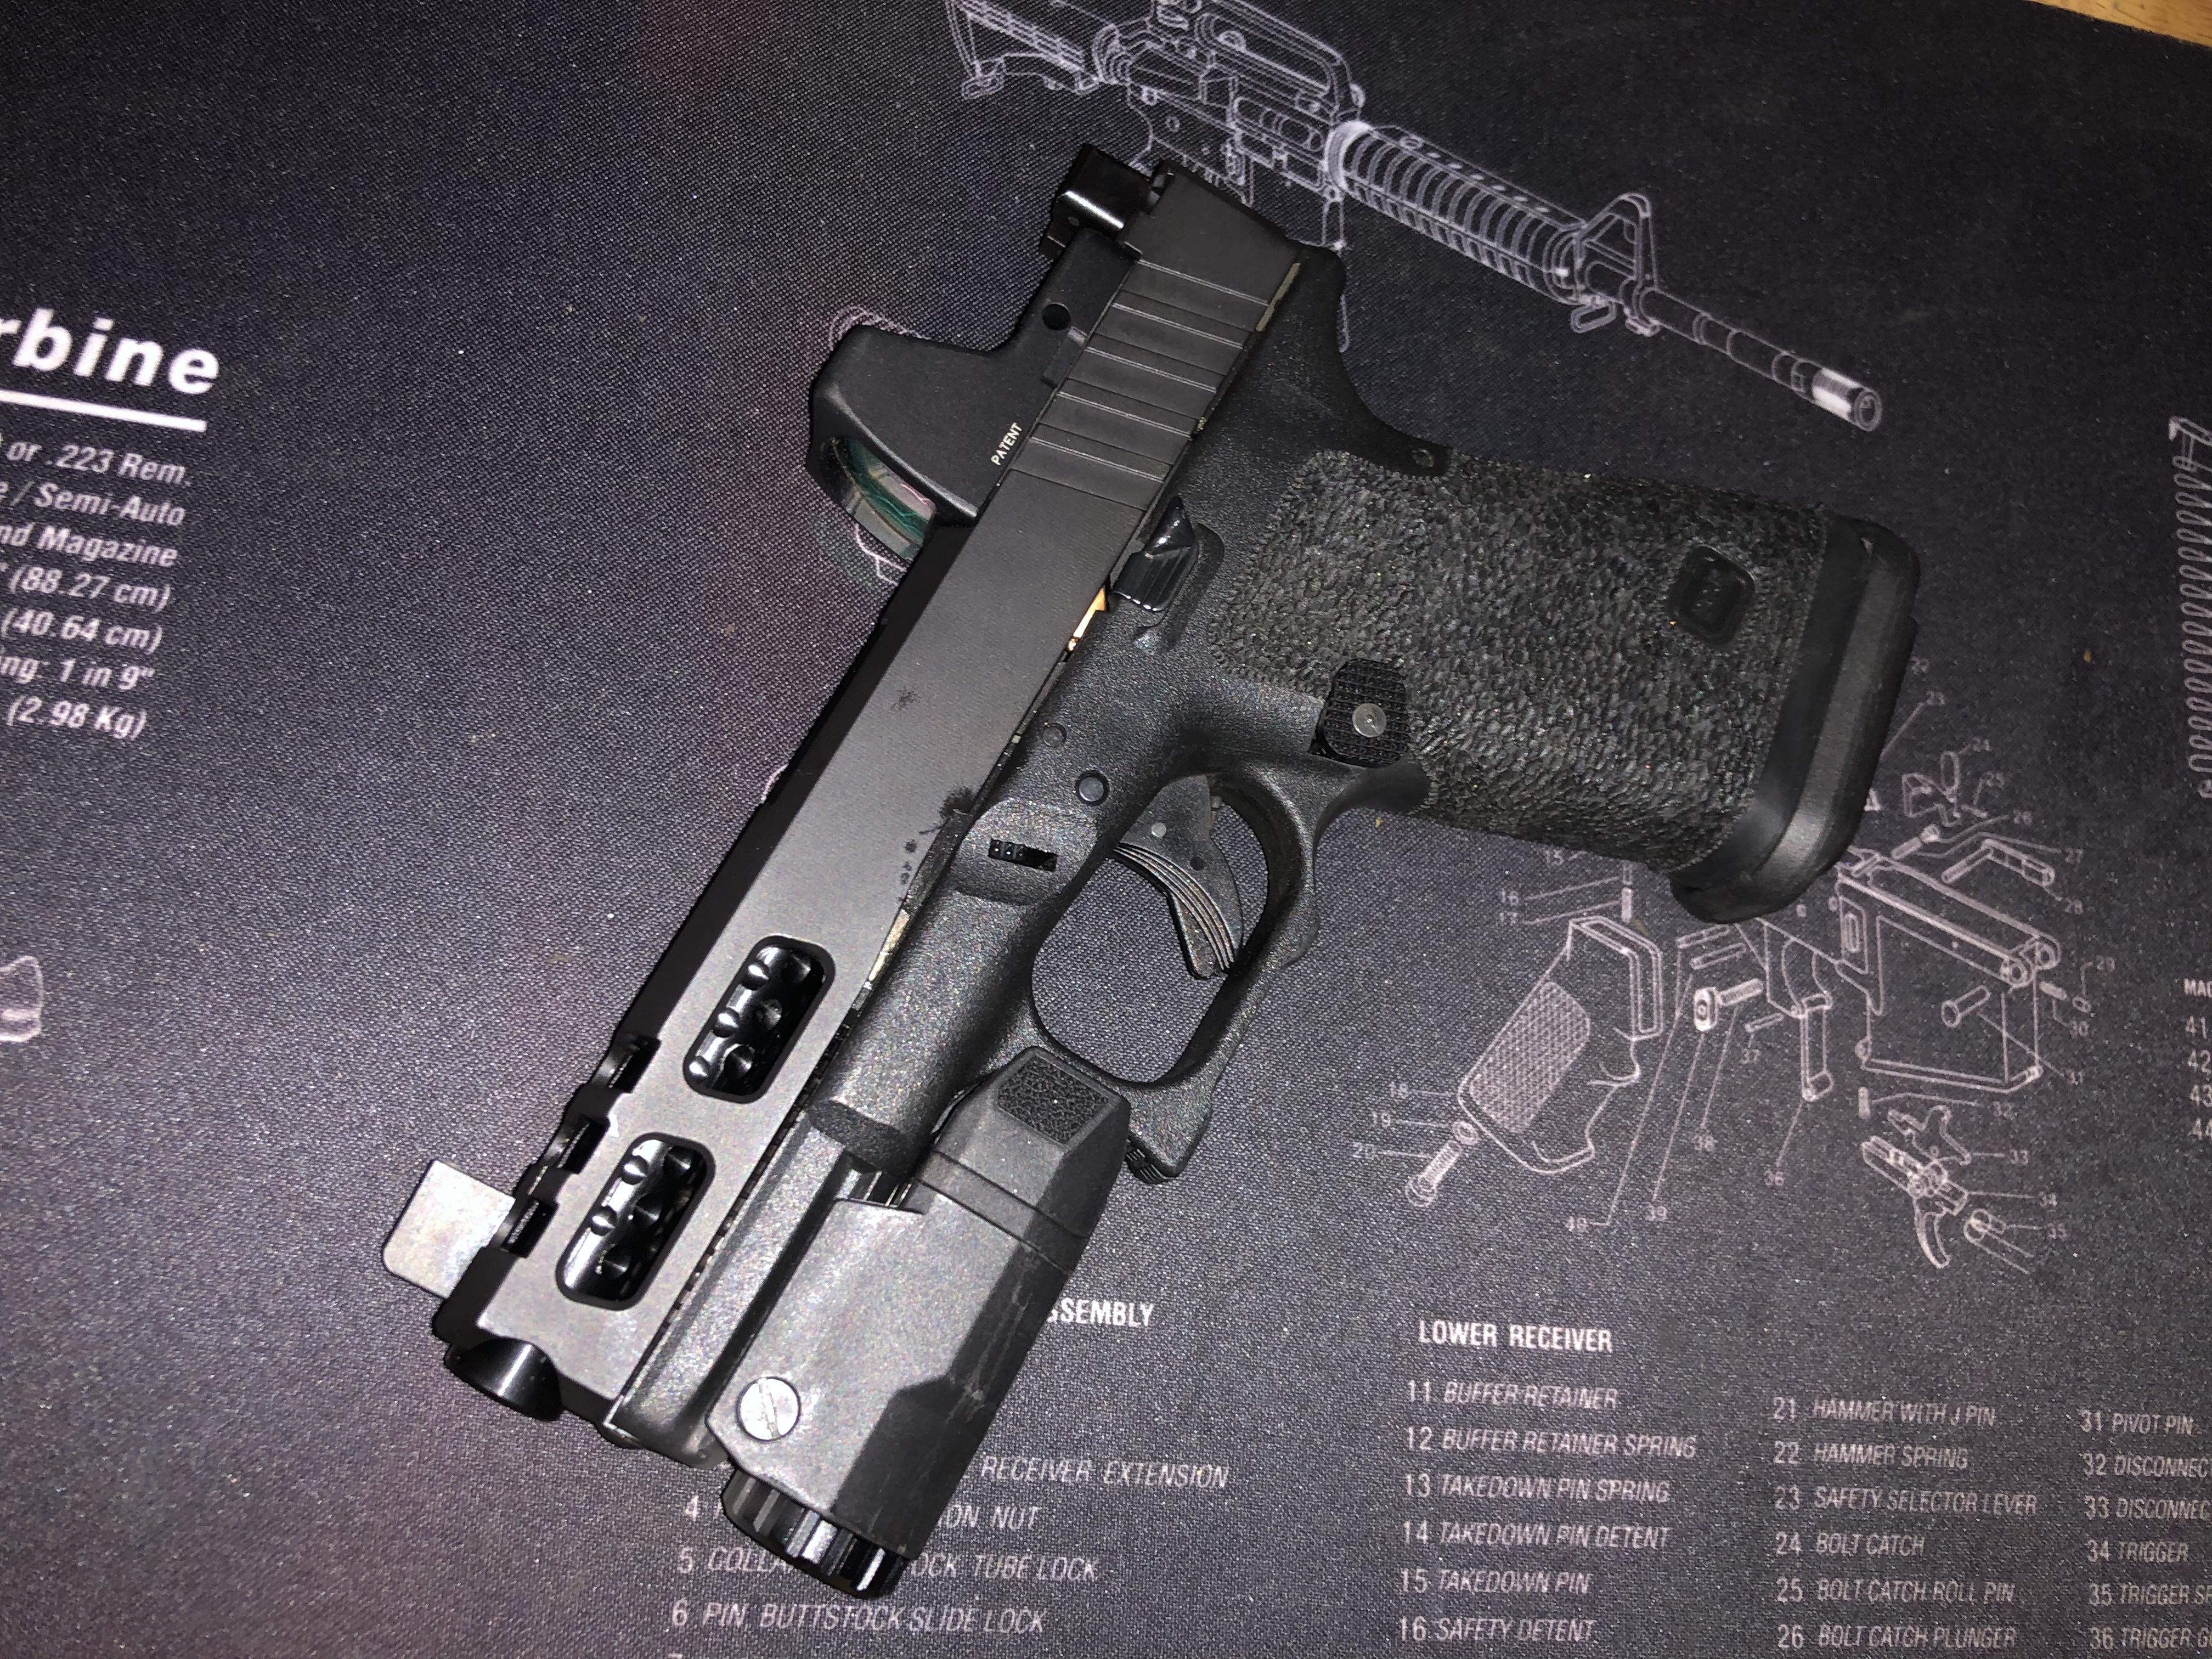 Gorilla Machining Glock 19 Black Custom Slides with Trijicon RMR cut out